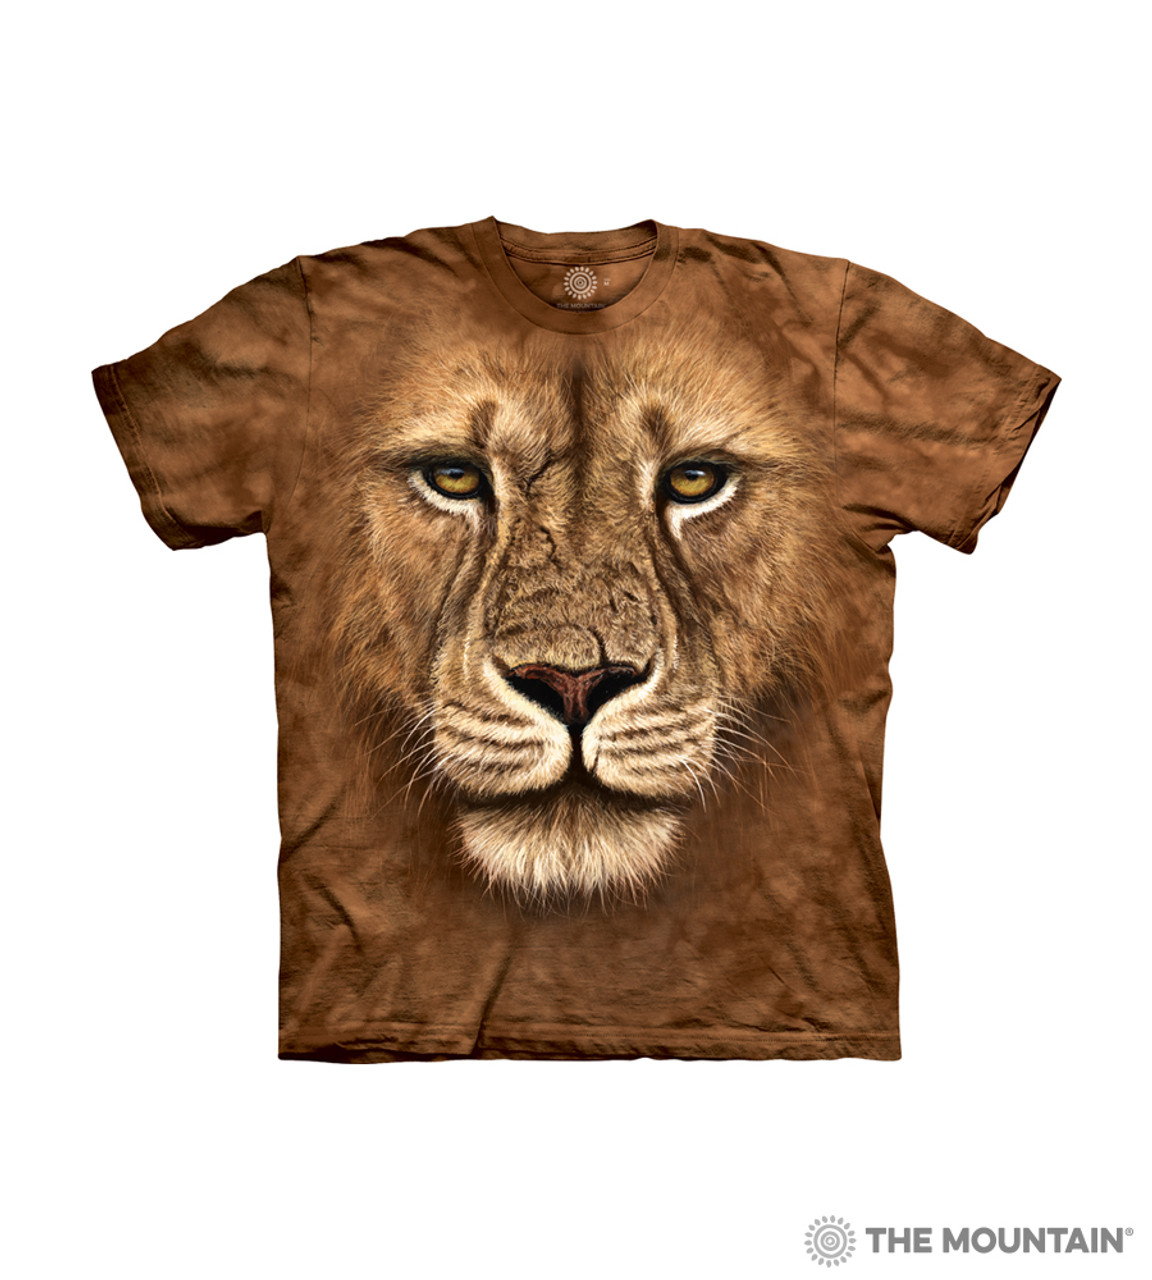 Kids Fantasy Rock Animals O-Neck T Shirts for Fashion Children Boys Girls Tee Shirt